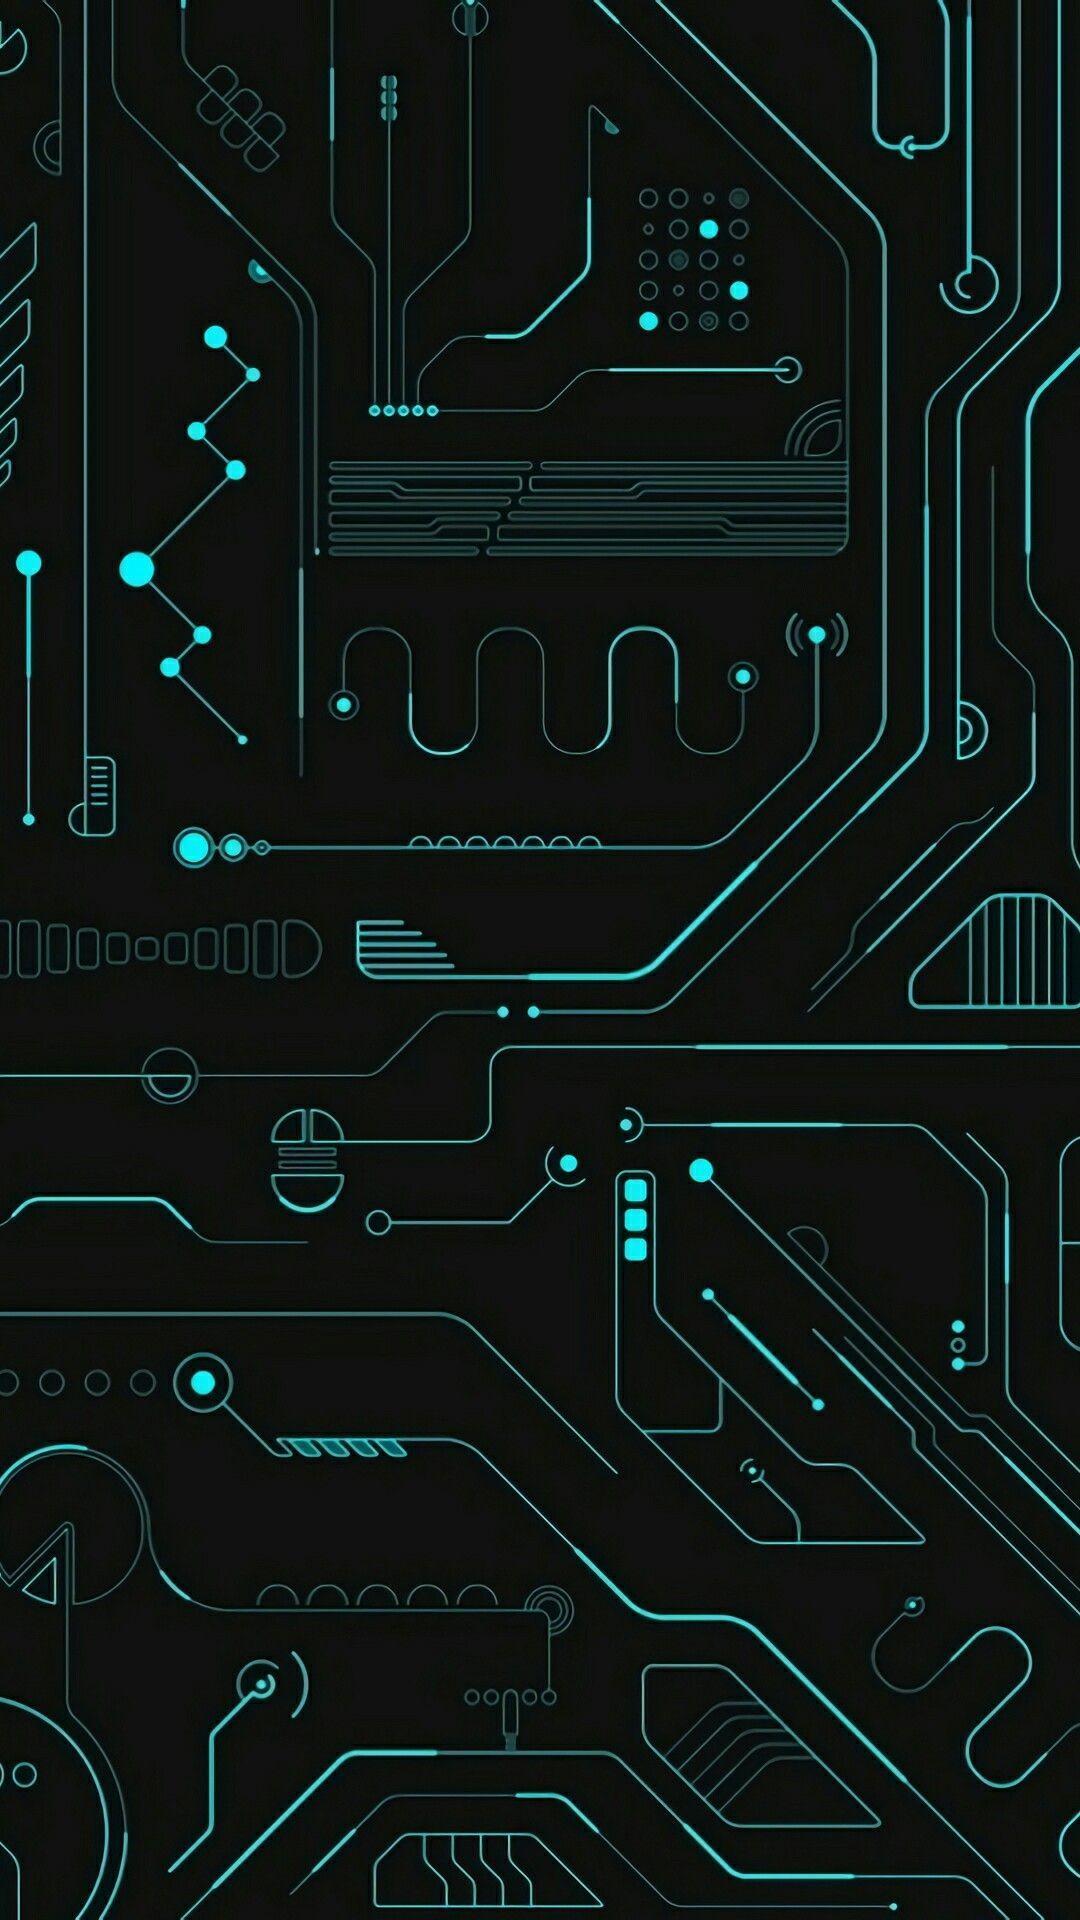 Hacker Phone Wallpapers Top Free Hacker Phone Backgrounds Wallpaperaccess